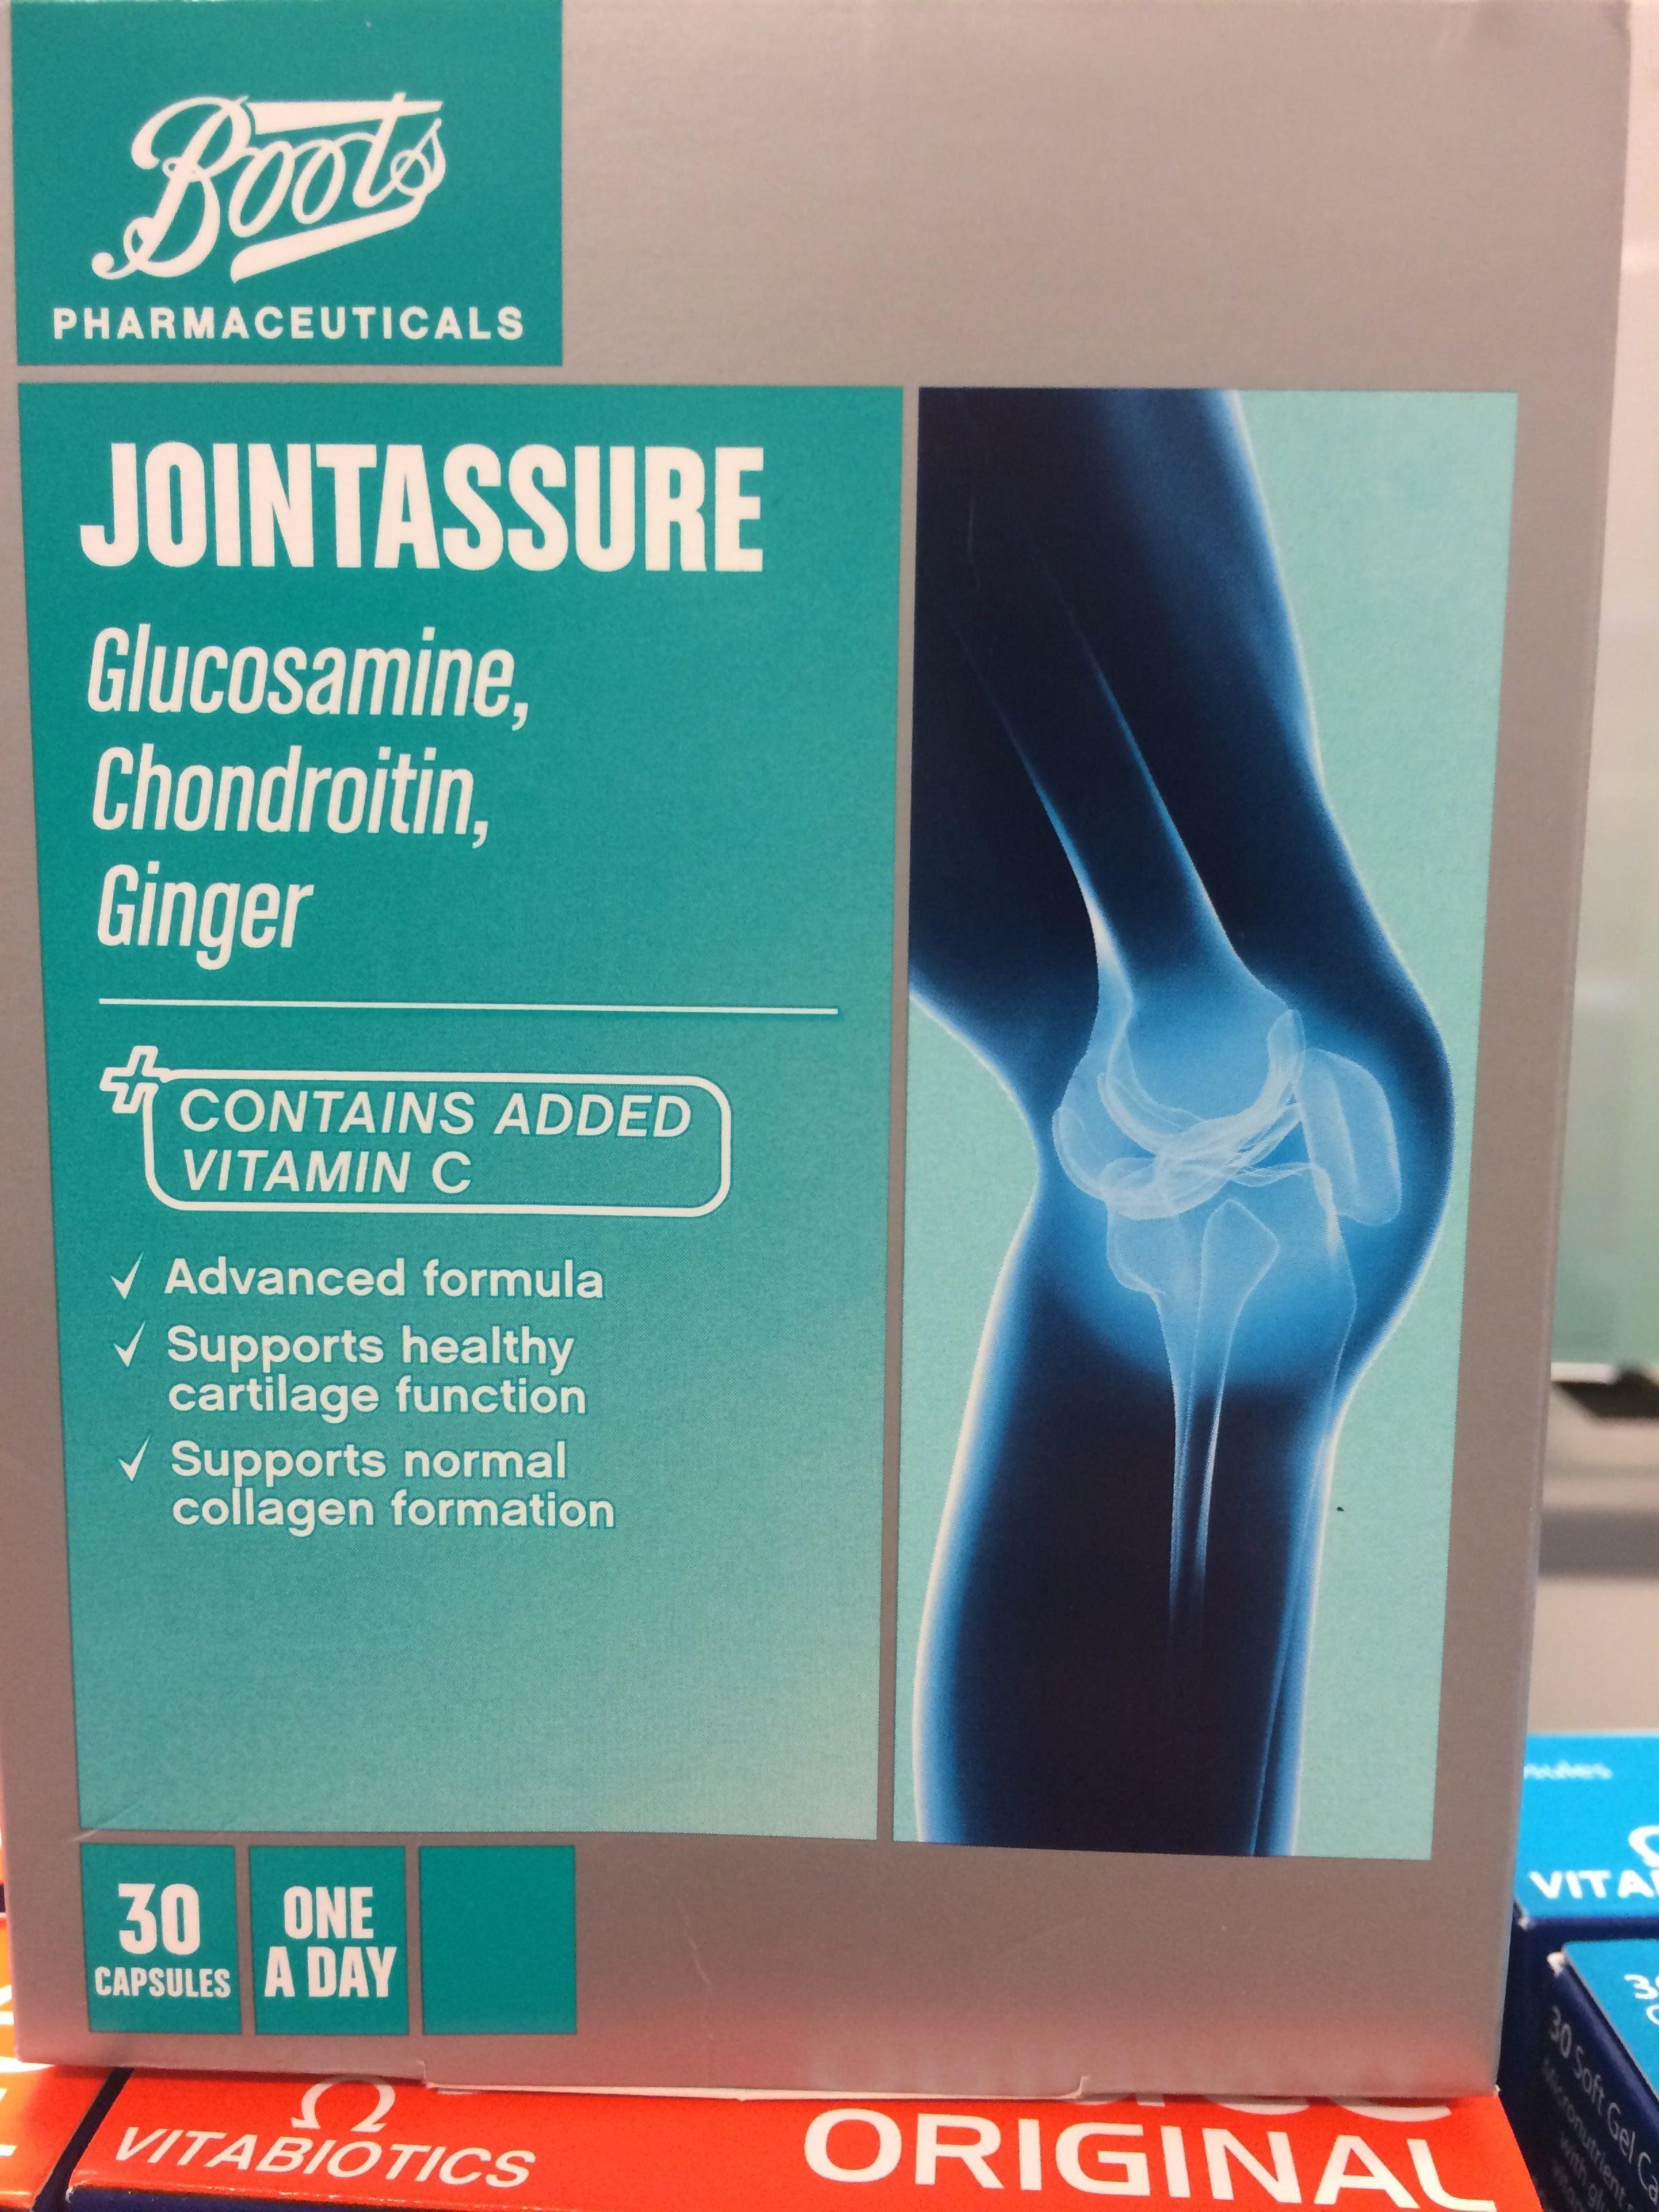 JOINTASSURE - Glucosamine, Chondroitin, Ginger - Product - en